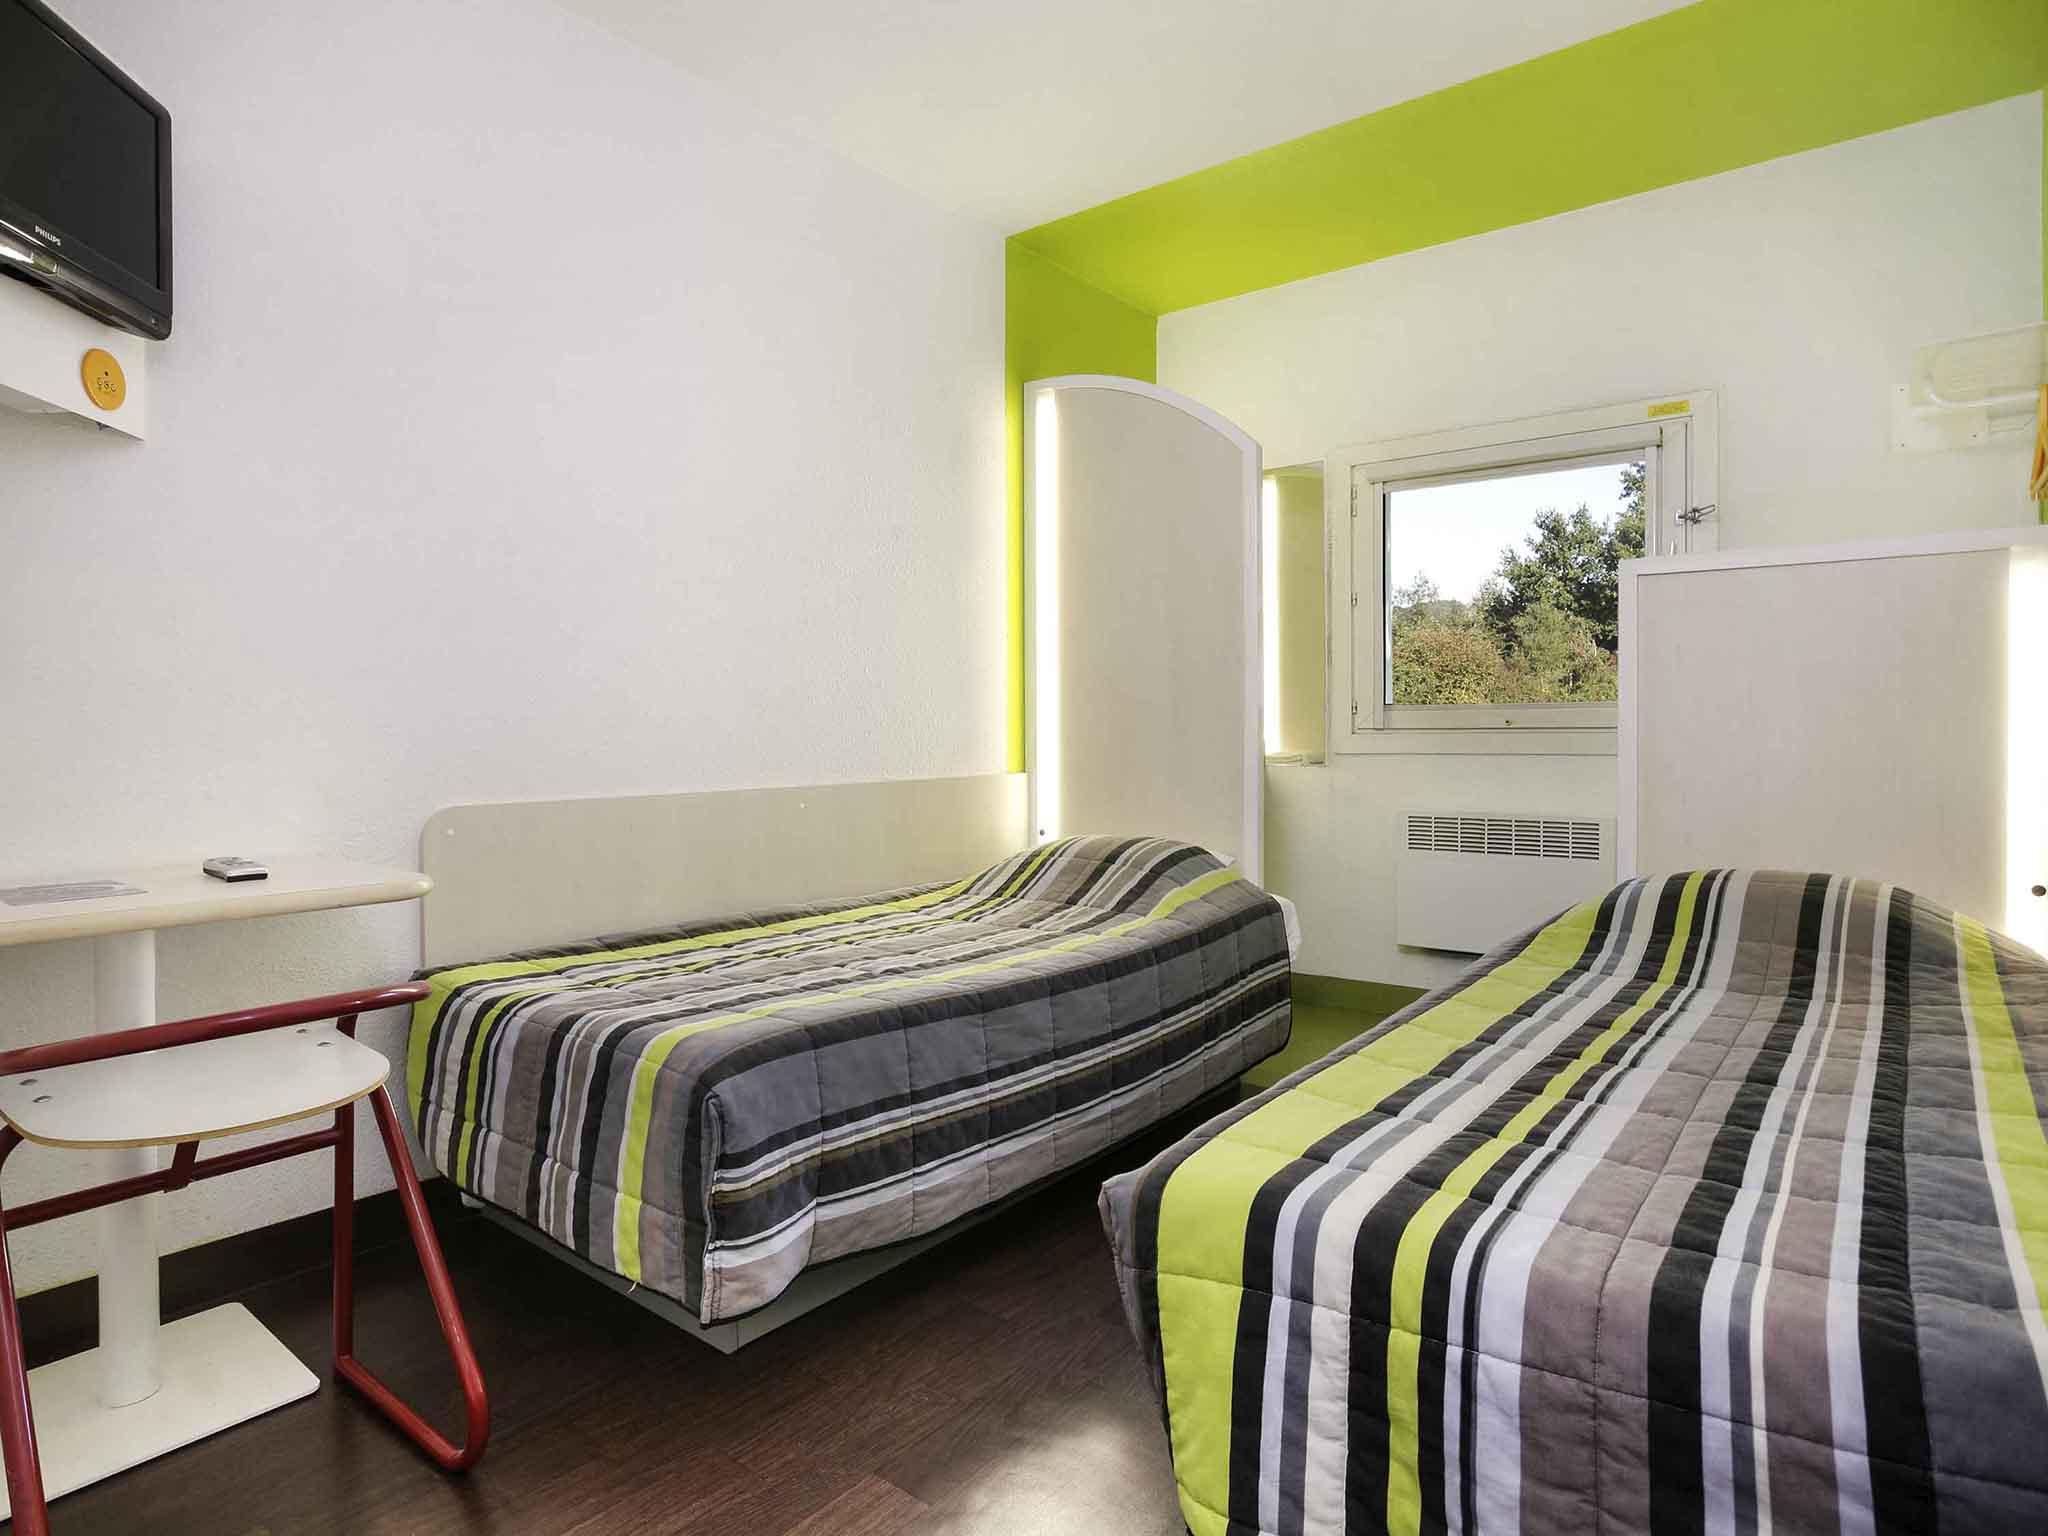 h tel ussac hotelf1 brive ussac. Black Bedroom Furniture Sets. Home Design Ideas